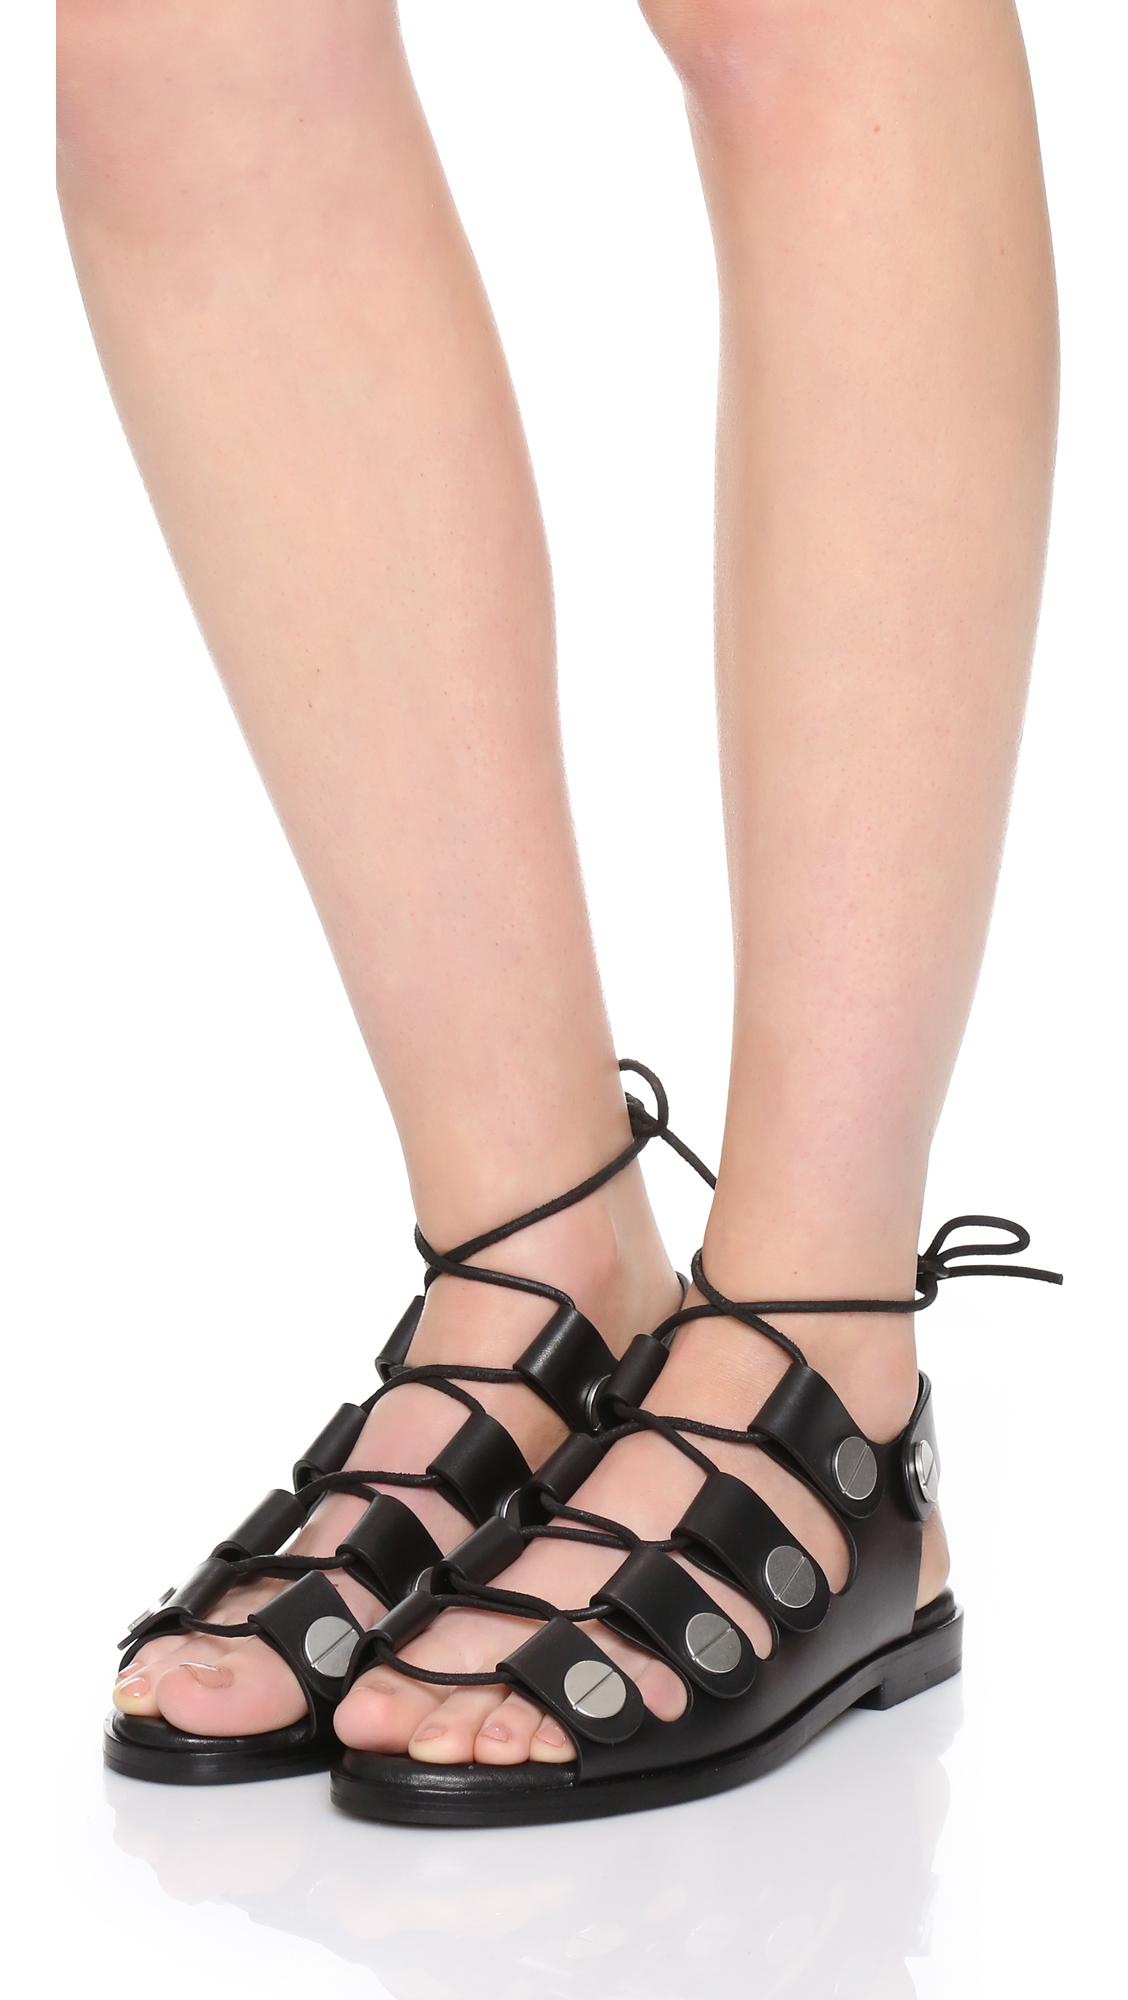 Alexander Wang Leather Gladiator Sandals. pJH6BRQYWZ